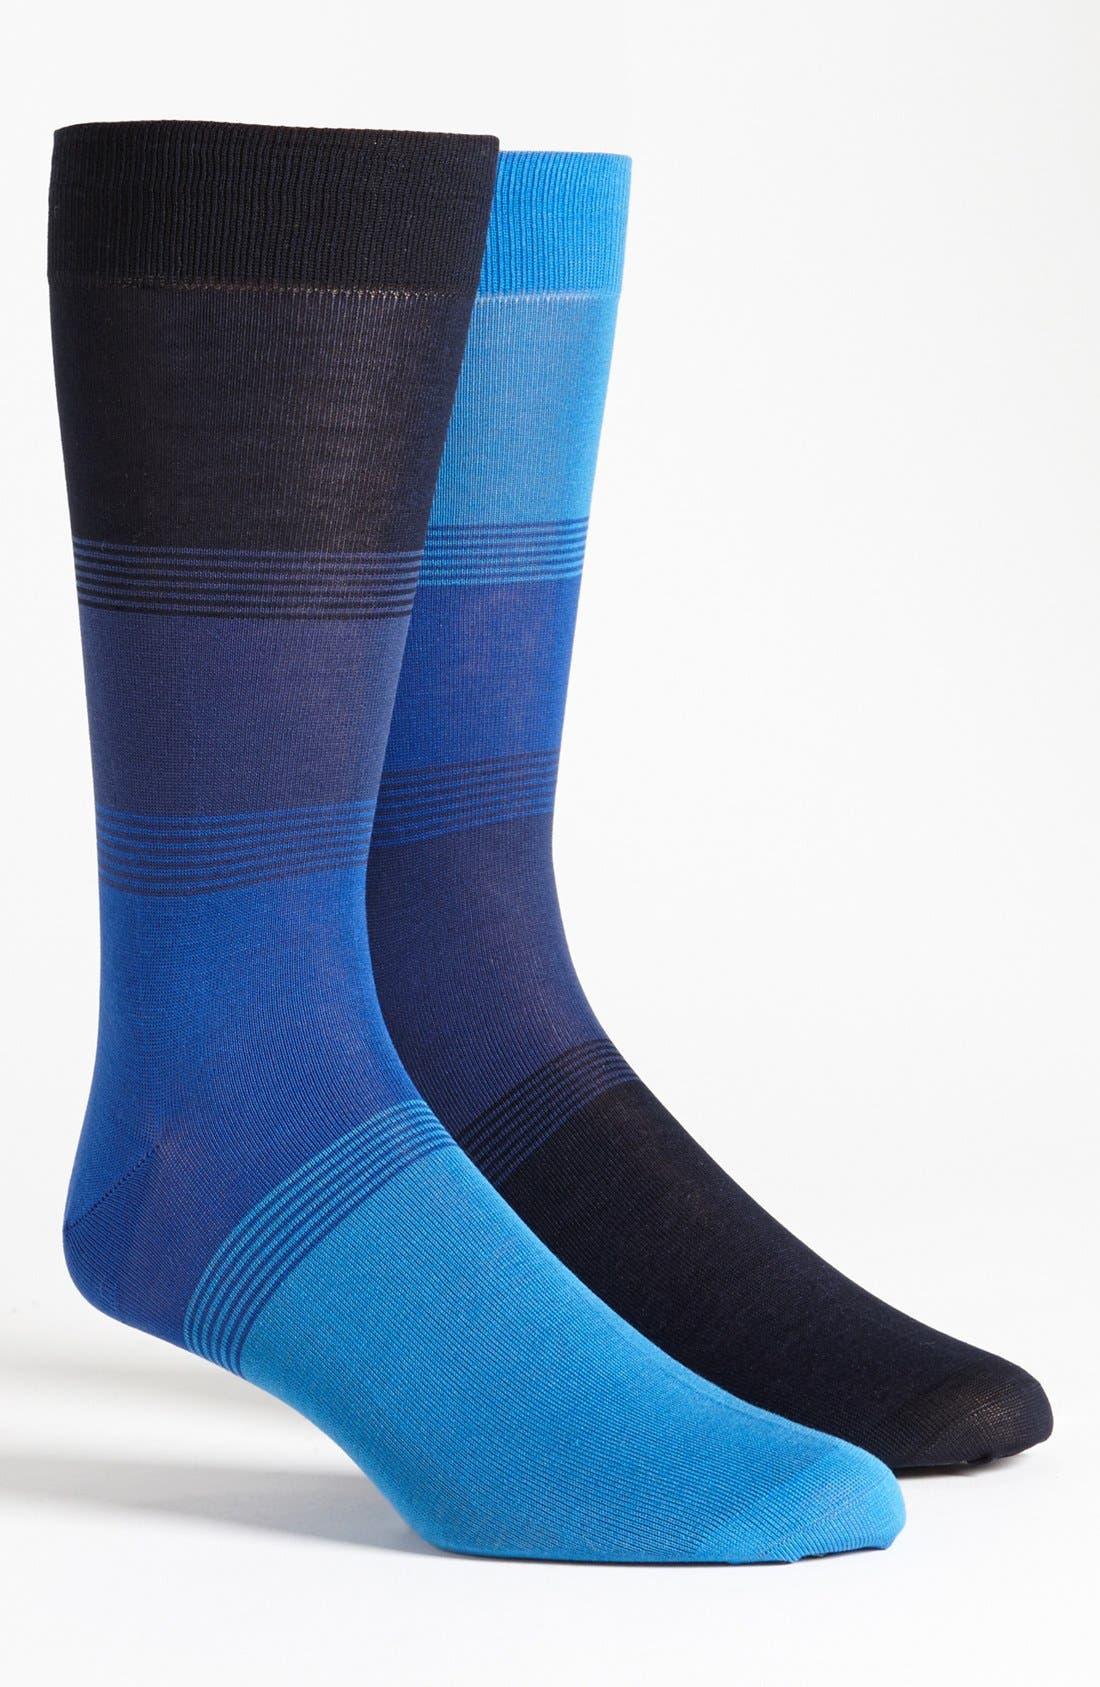 Main Image - Pantherella for Ted Baker London Stripe Socks